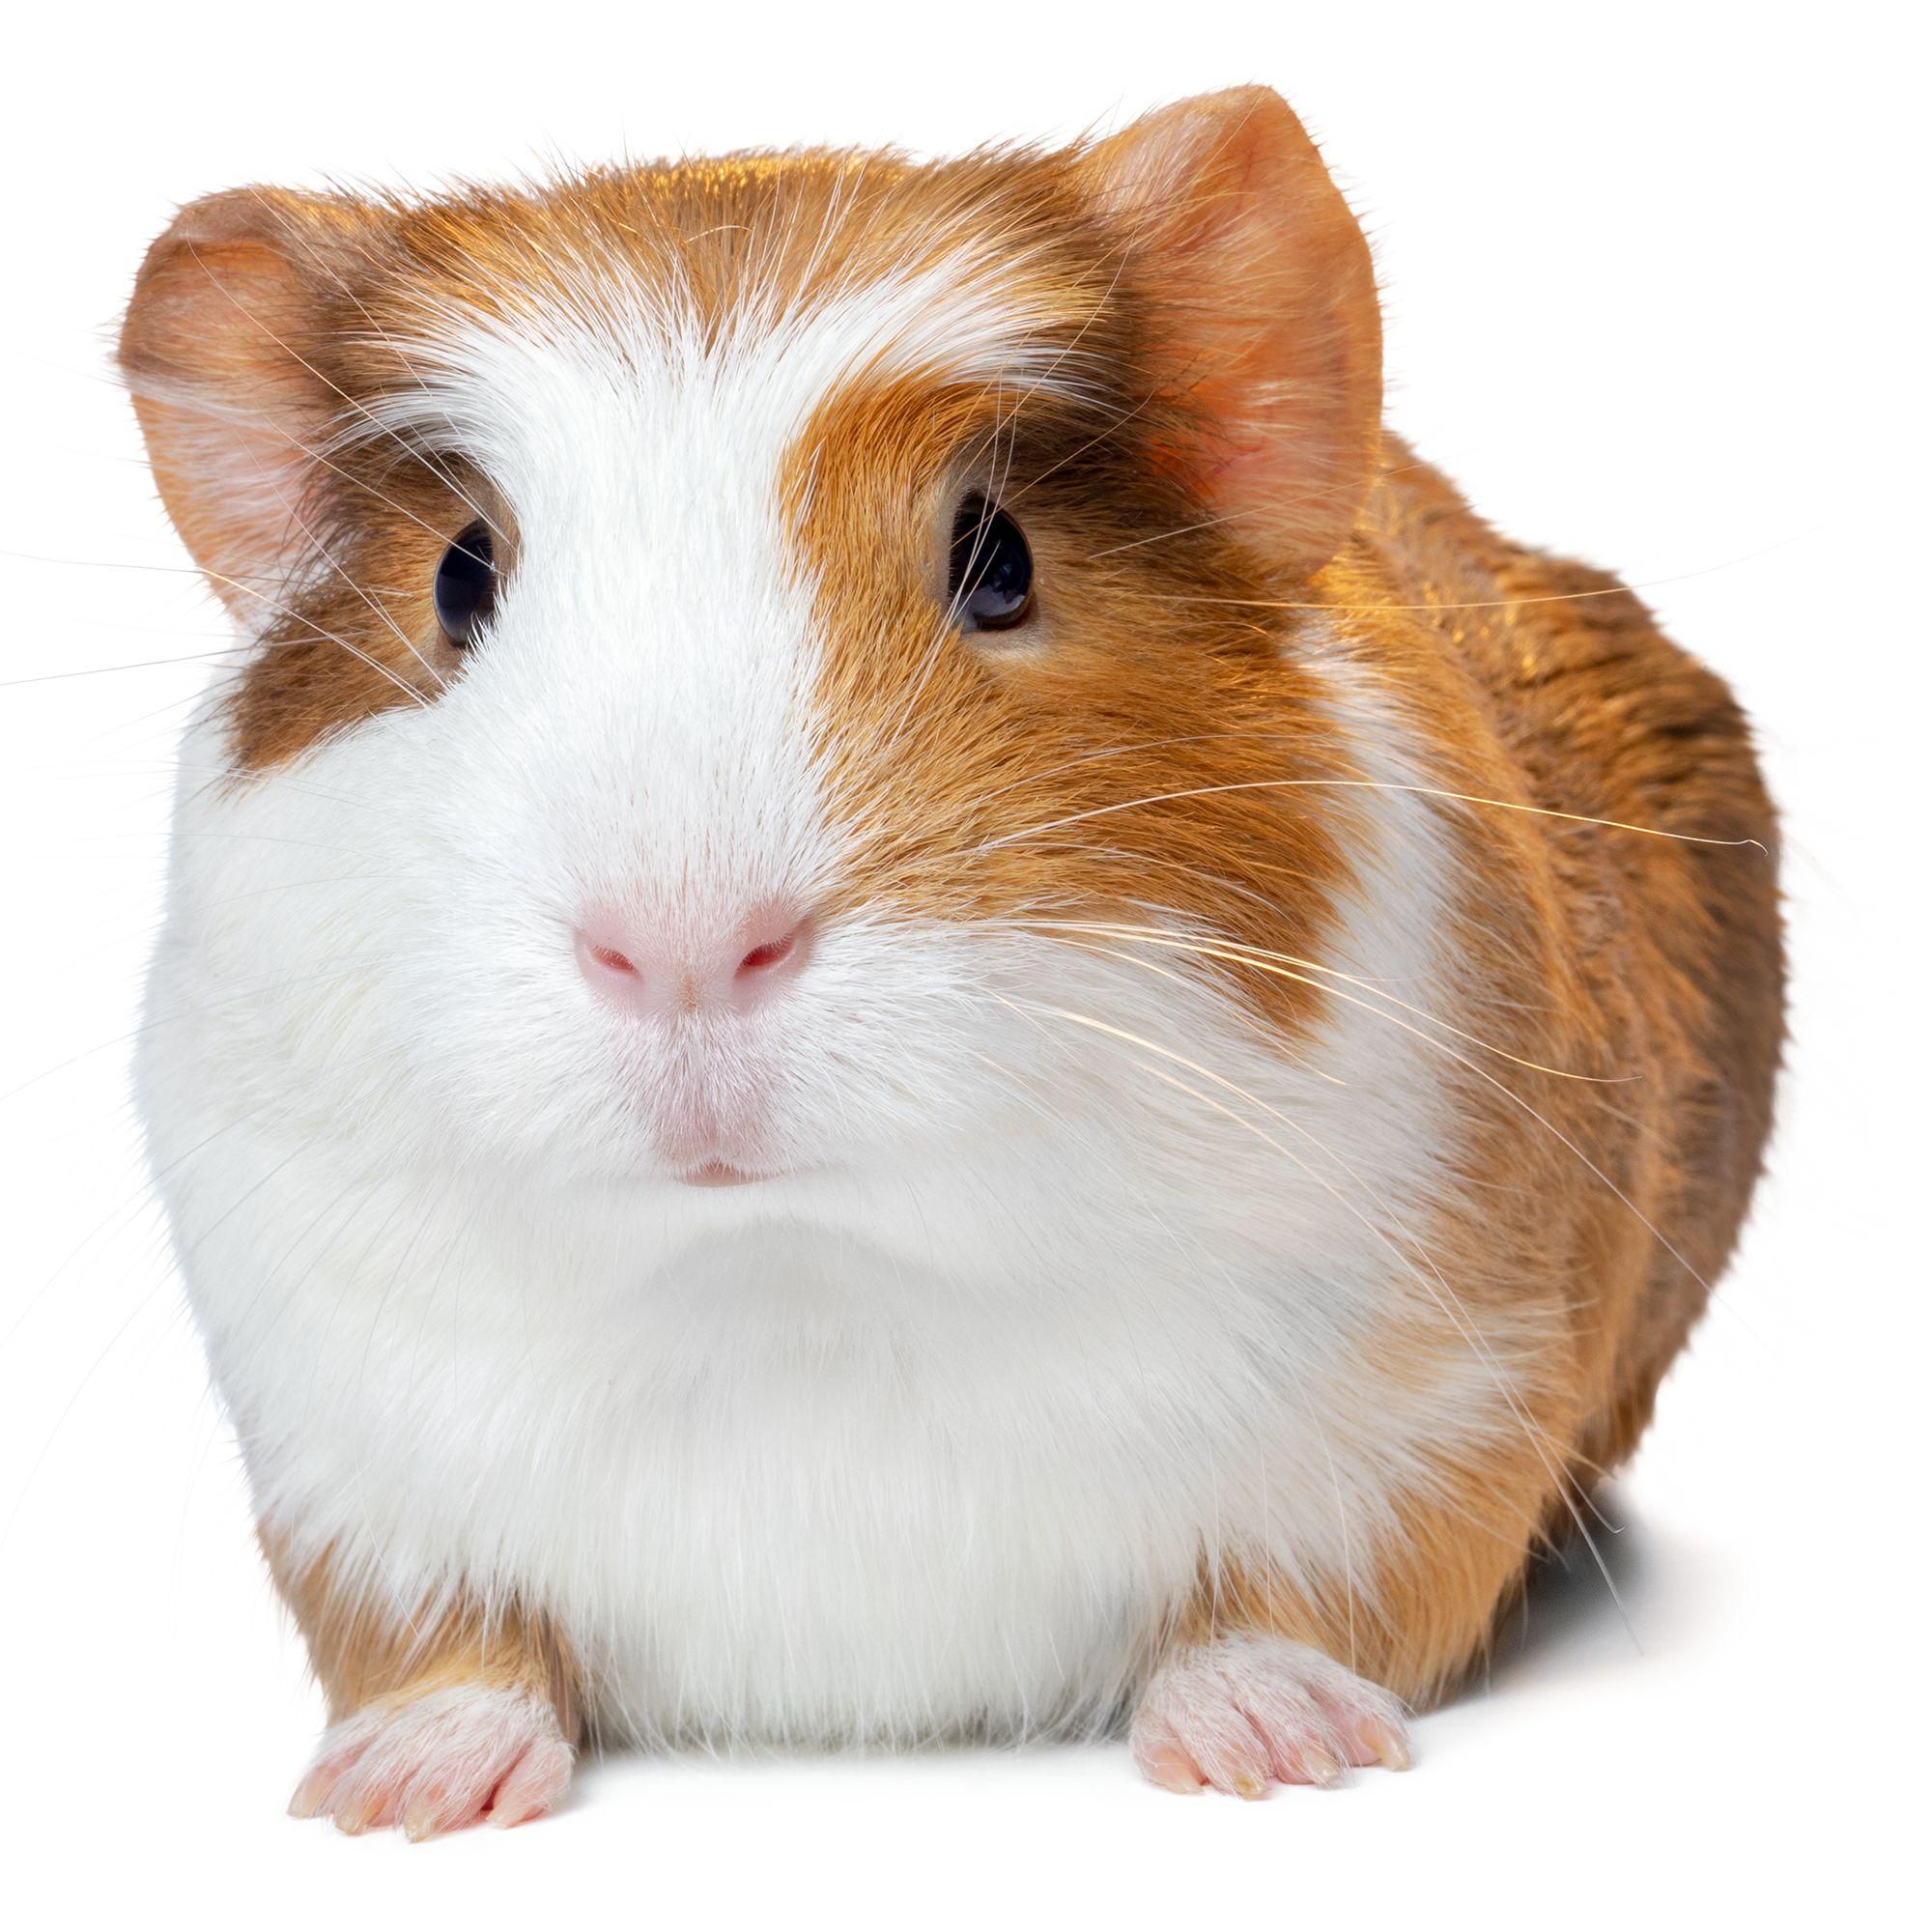 Male Guinea Pig For Sale | Live Small Pets | PetSmart